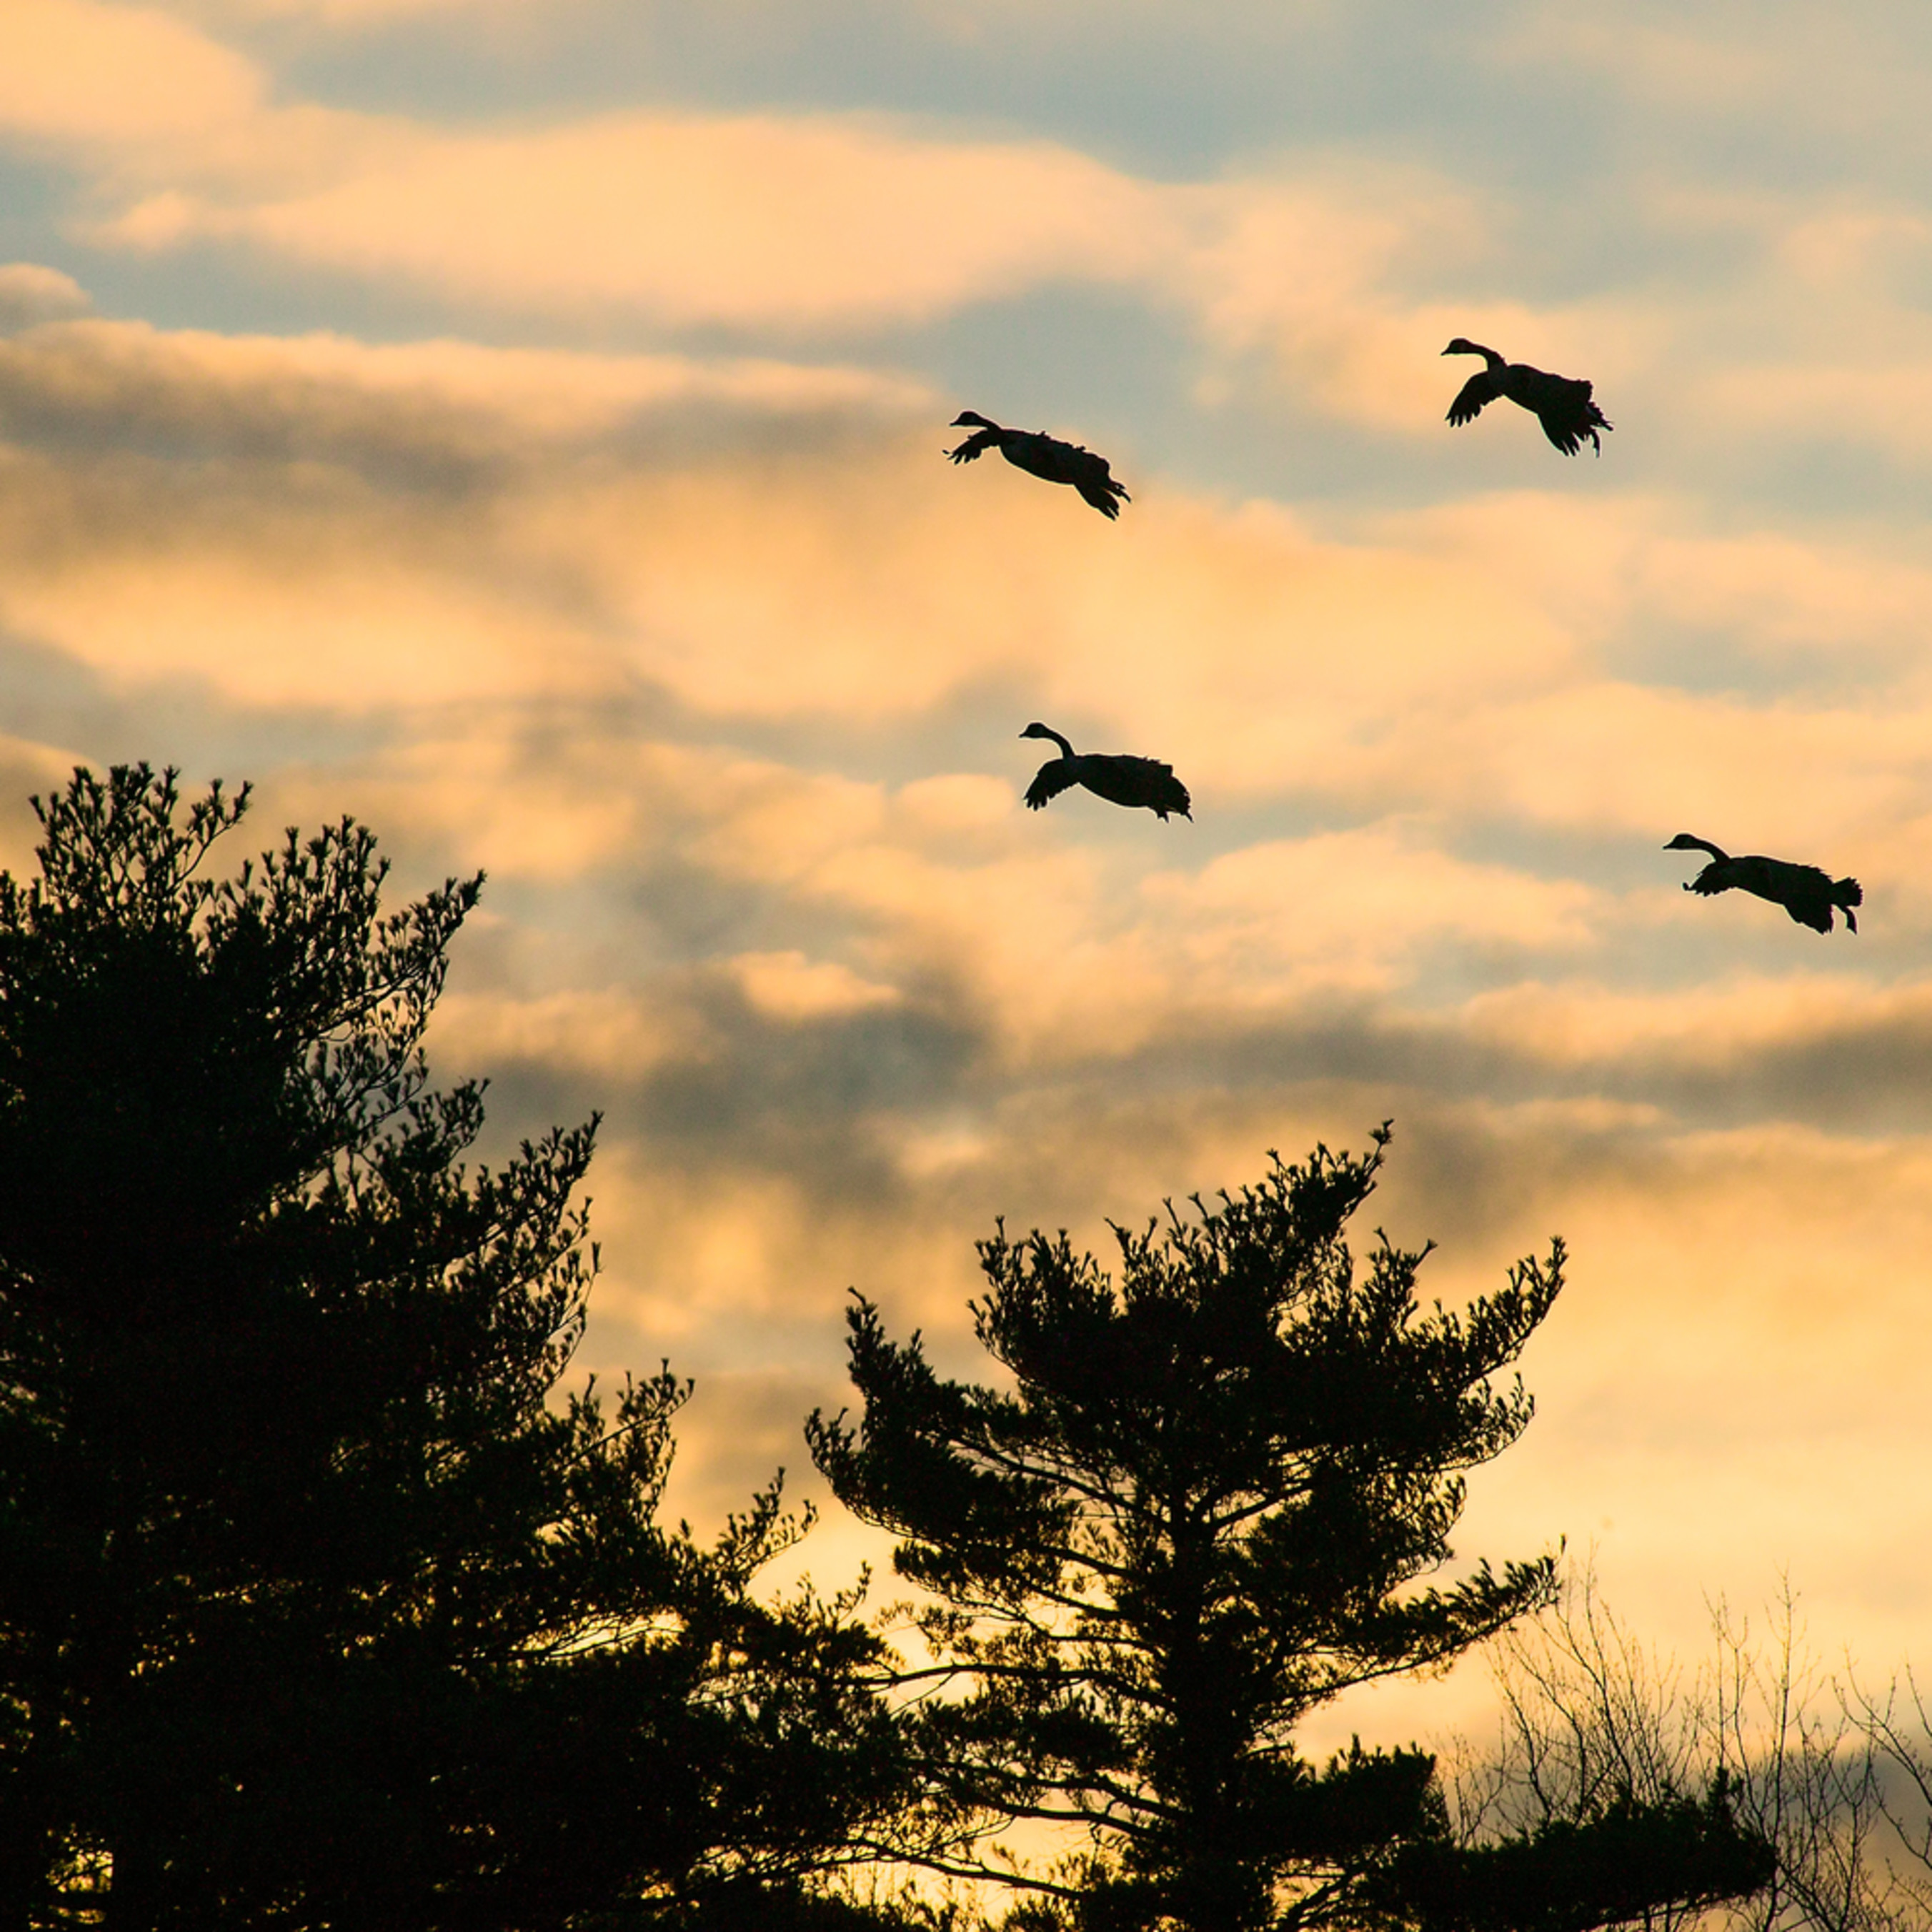 20061212 geese 023 2 pr bamuju